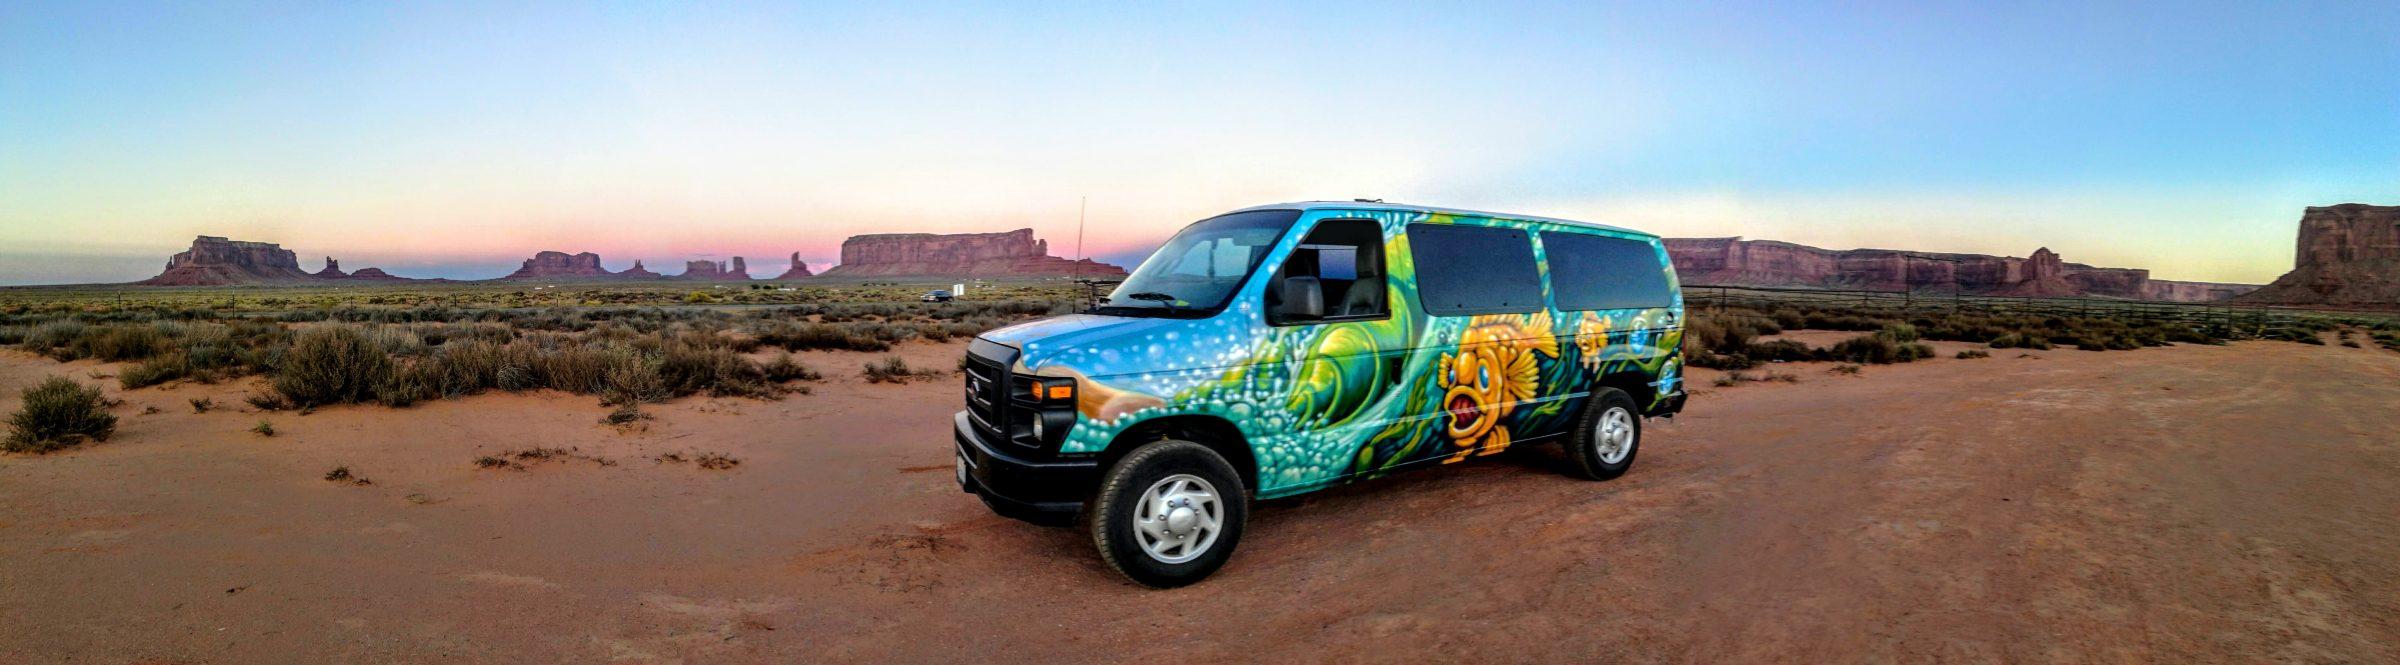 Escape Campervans - Monument Valley